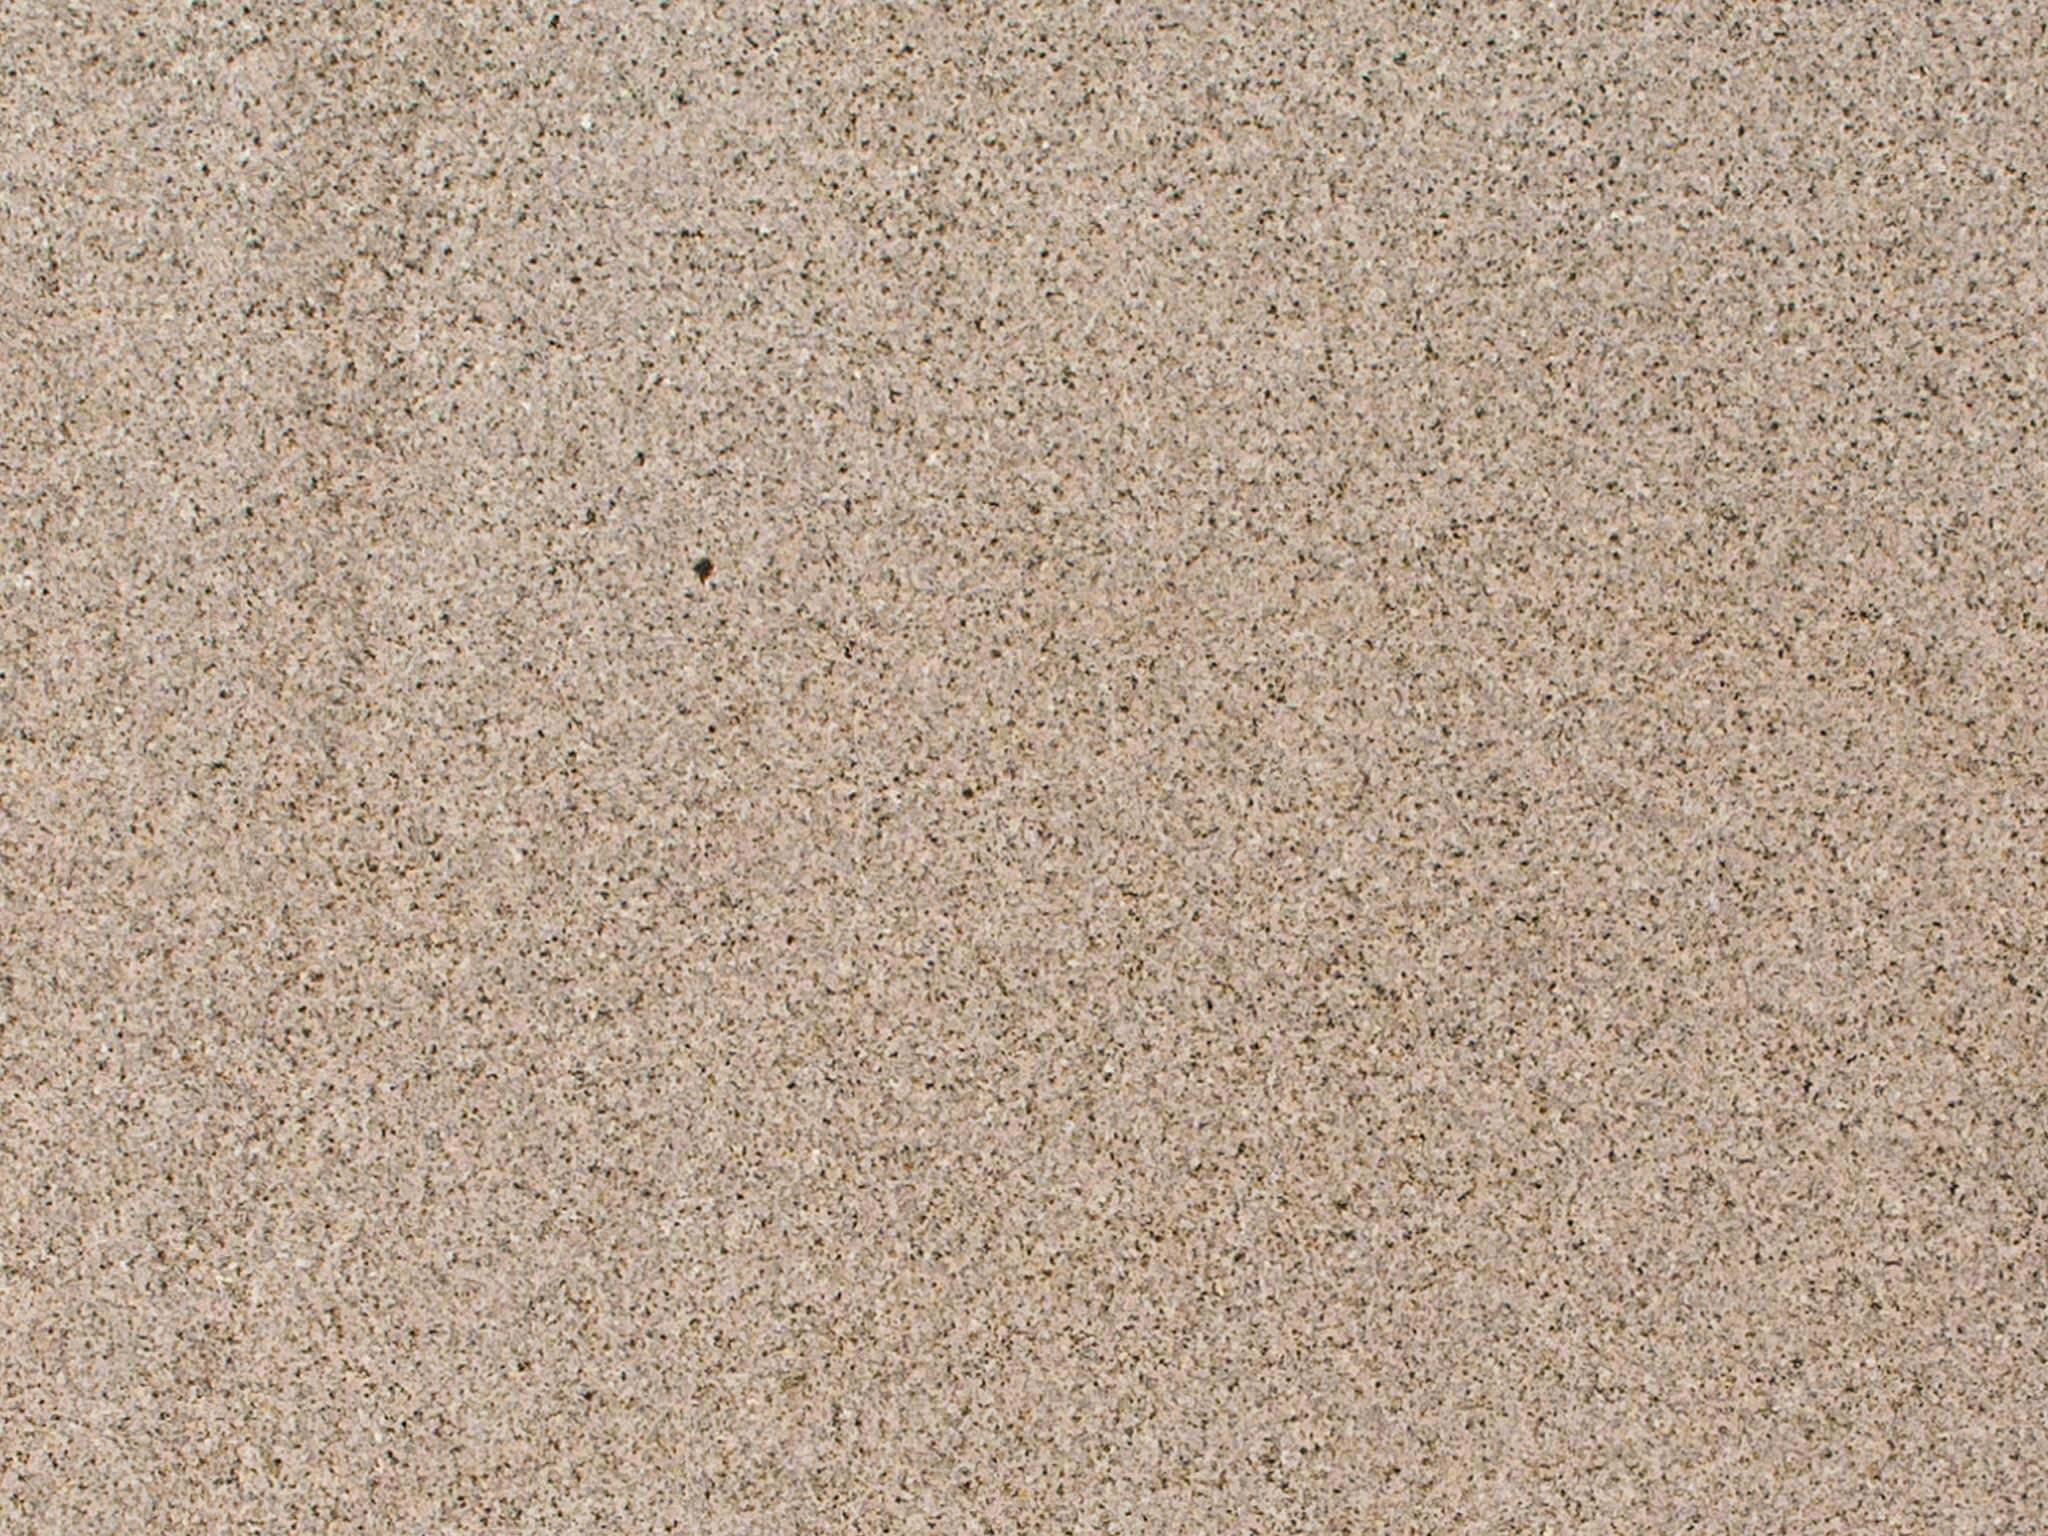 Giallo Fantasia Granite  Jpg 2_1448725030 40c9cd09e7d34e2f9f3c9075c7b831a2